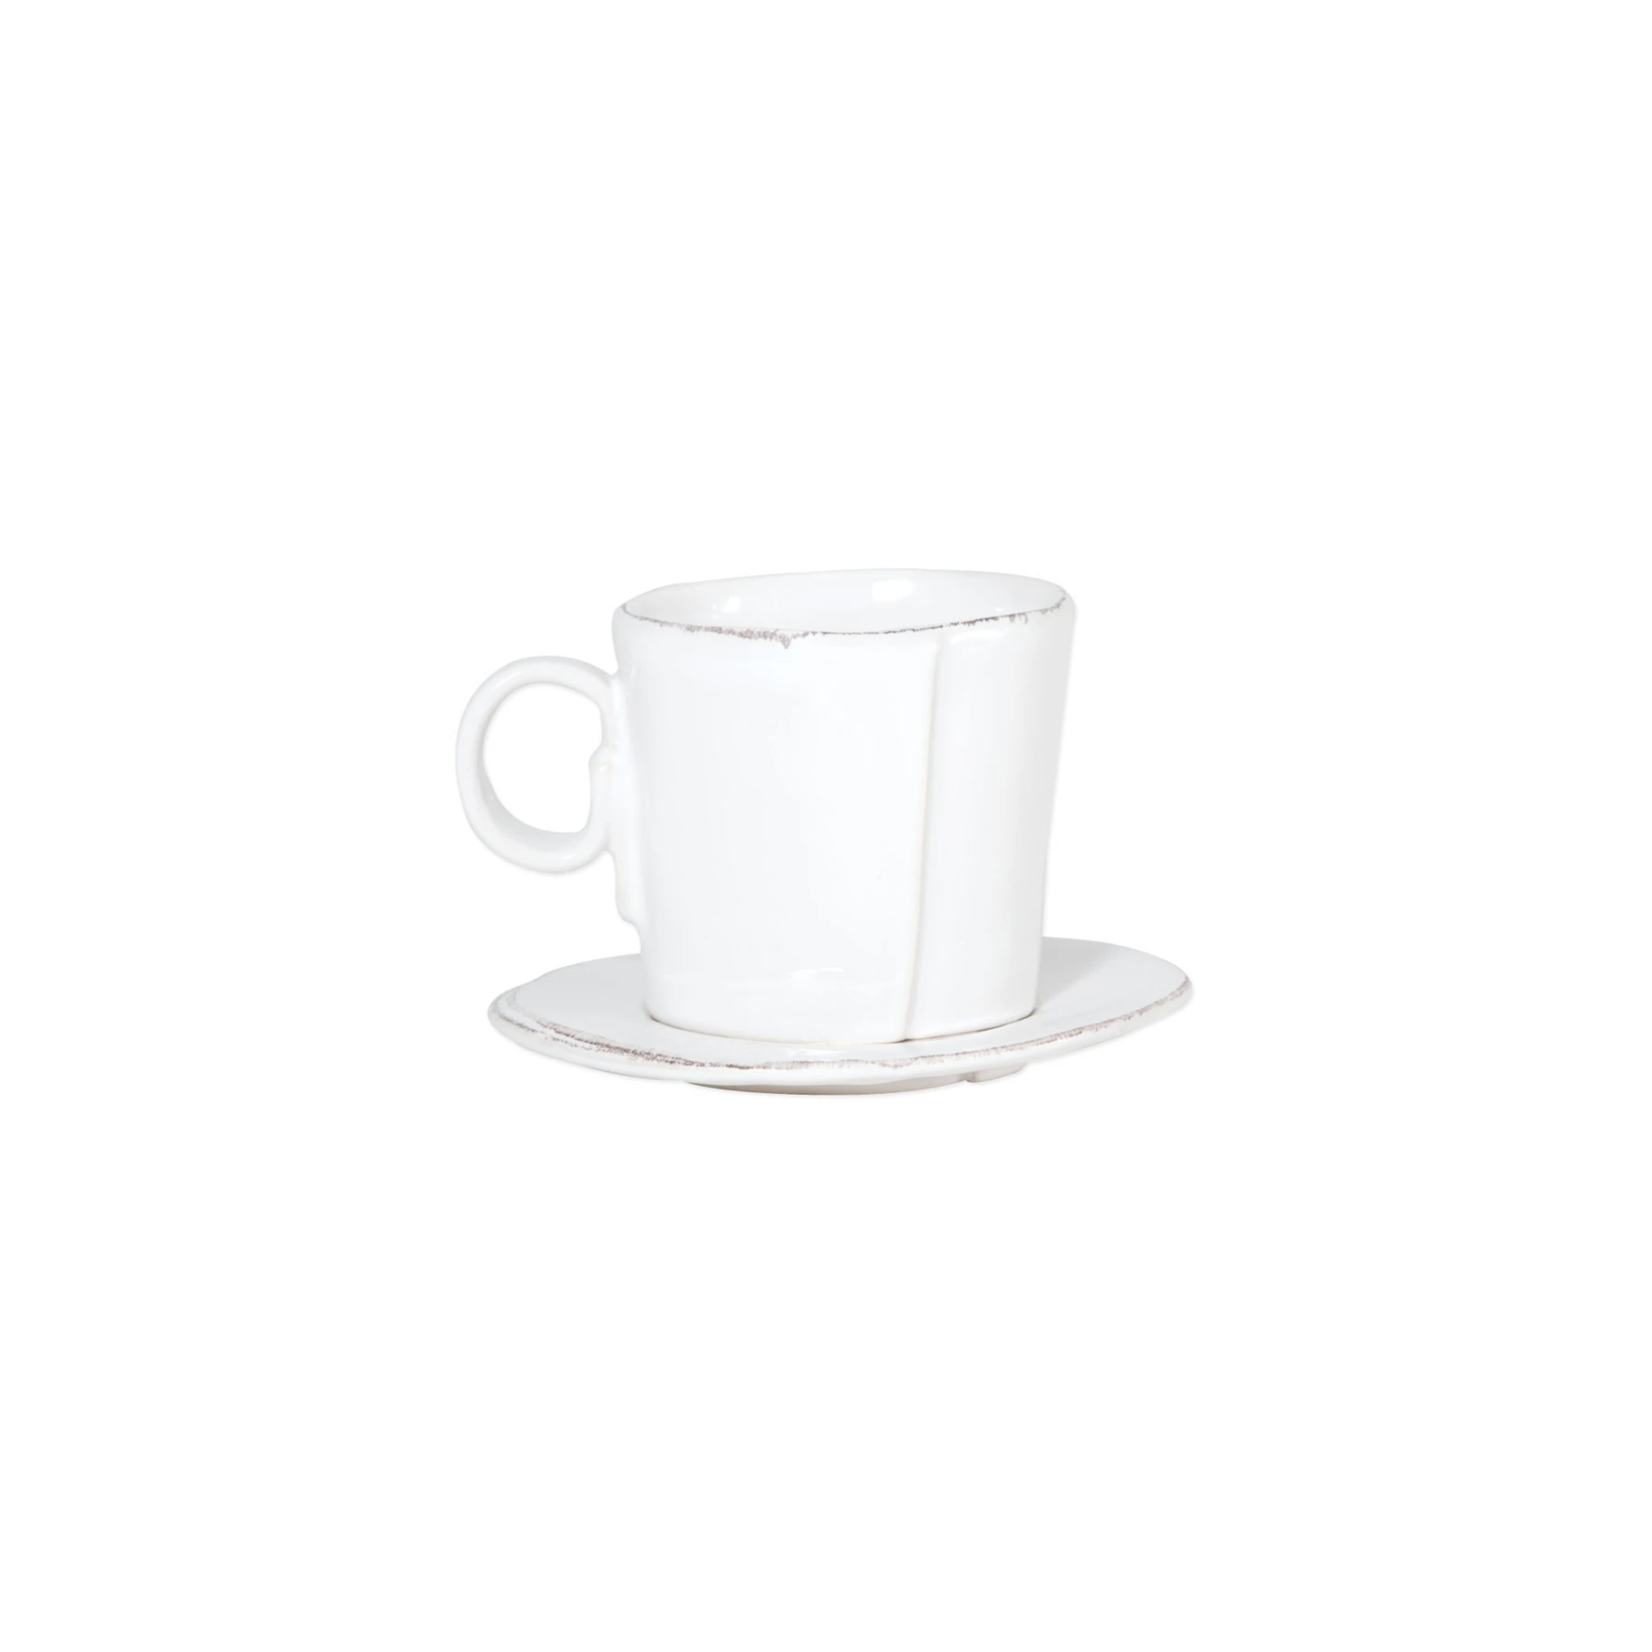 Vietri Lastra Espresso Cup & Saucer